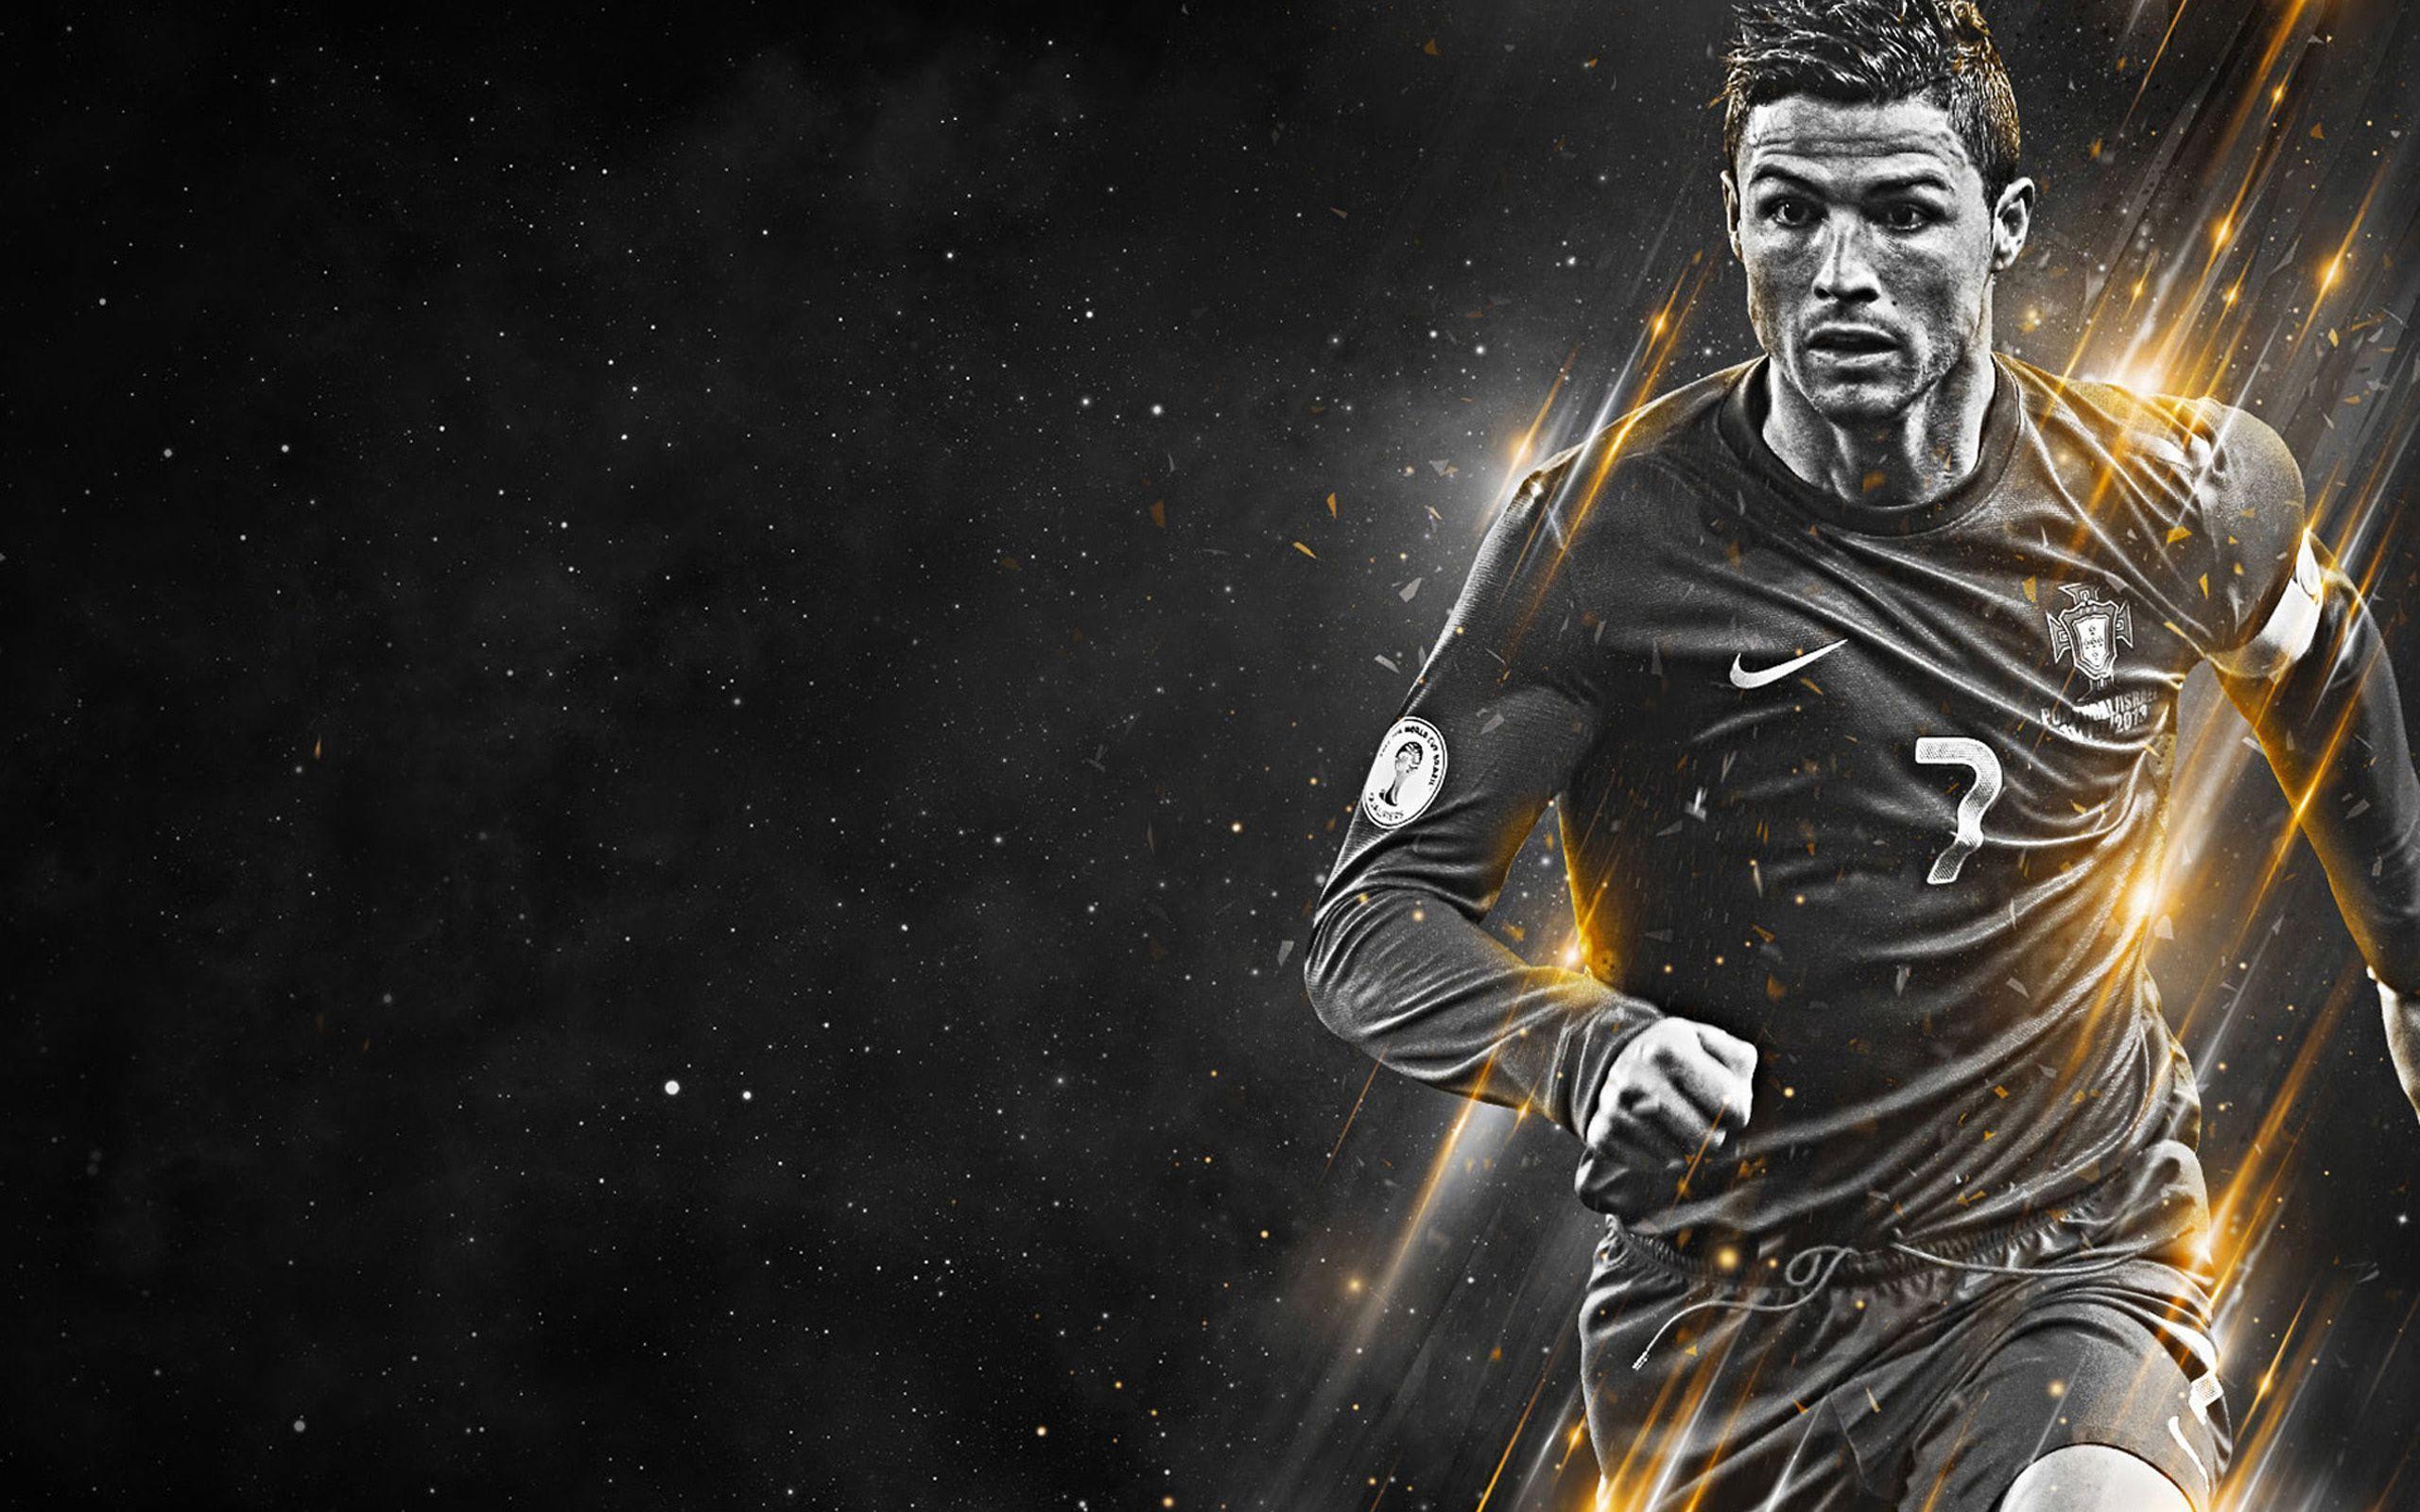 Cristiano Ronaldo 7 Wallpapers 2015 - Wallpaper Cave